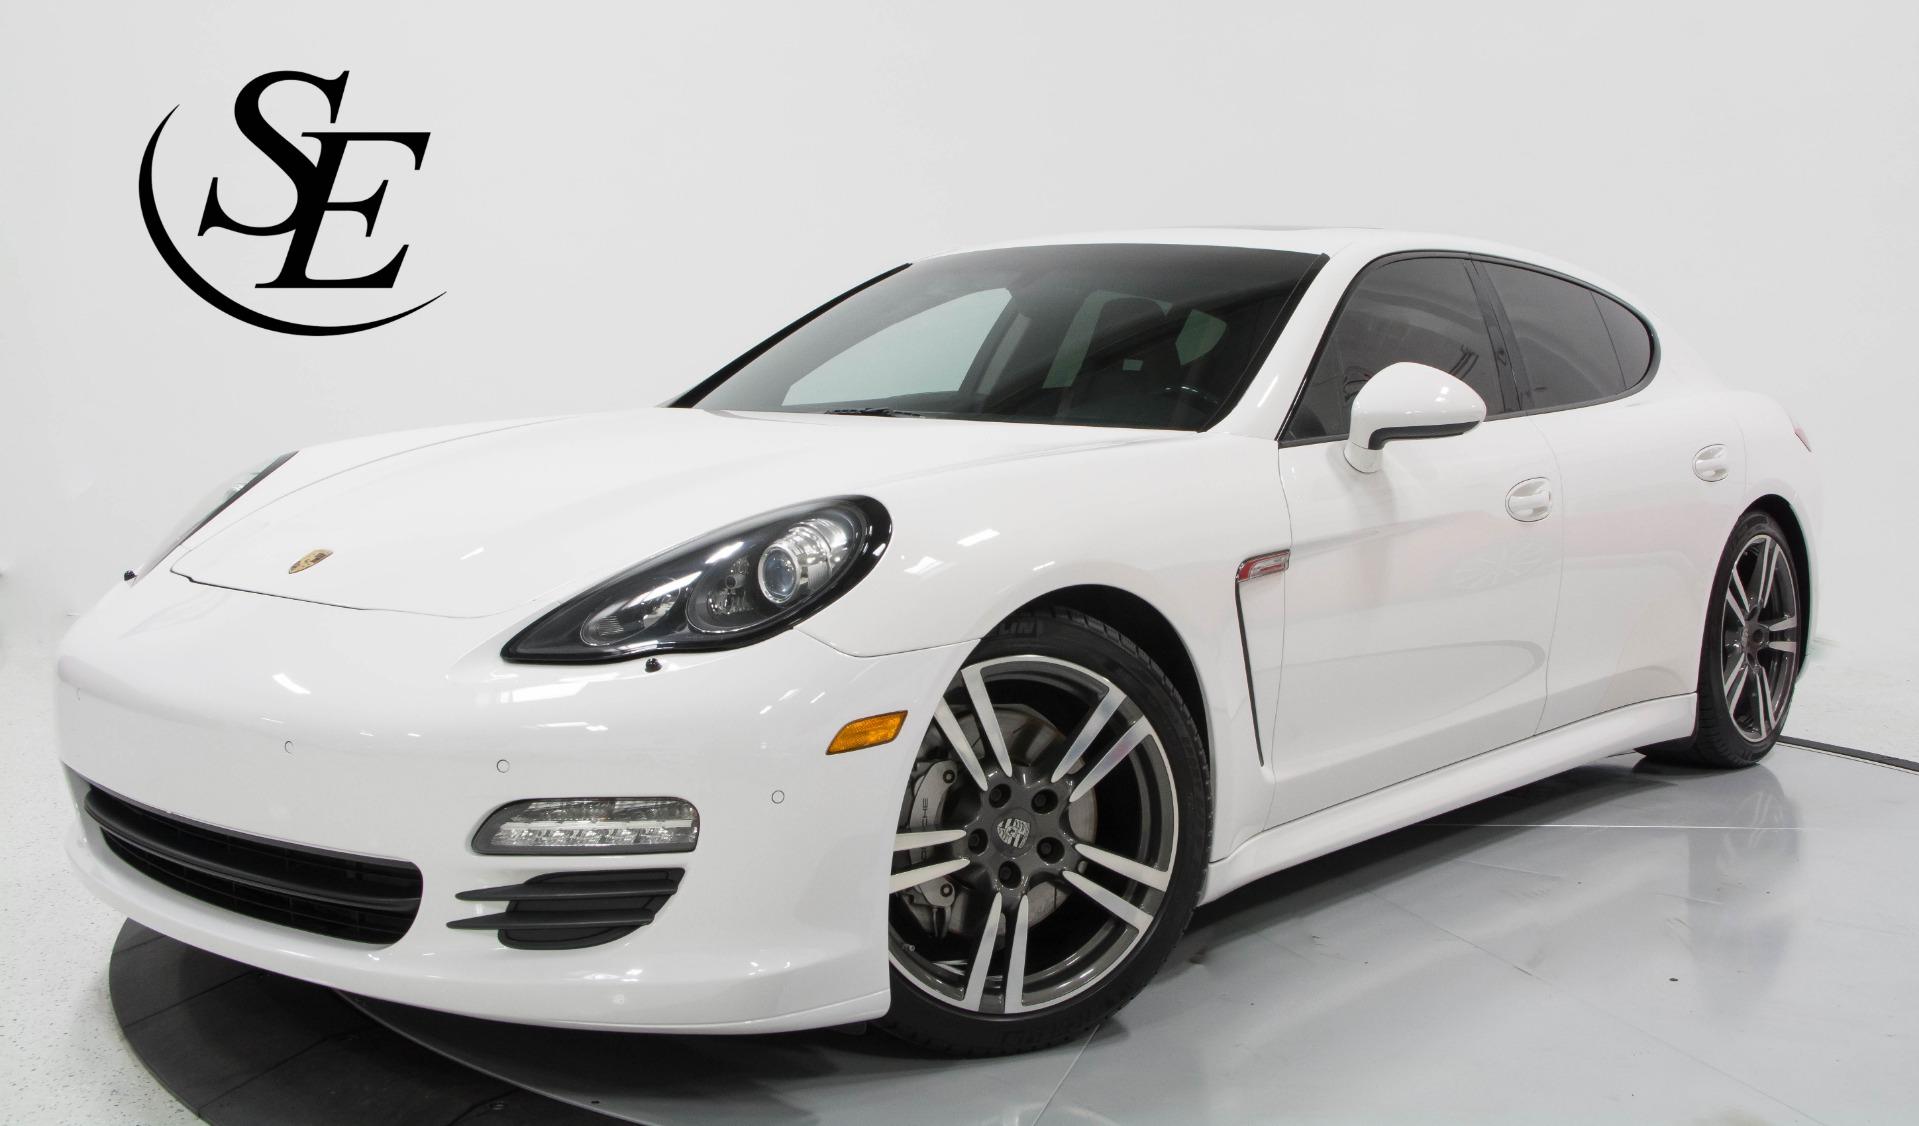 2012 Porsche Panamera S 4dr Sedan Stock # 22510 for sale near ...